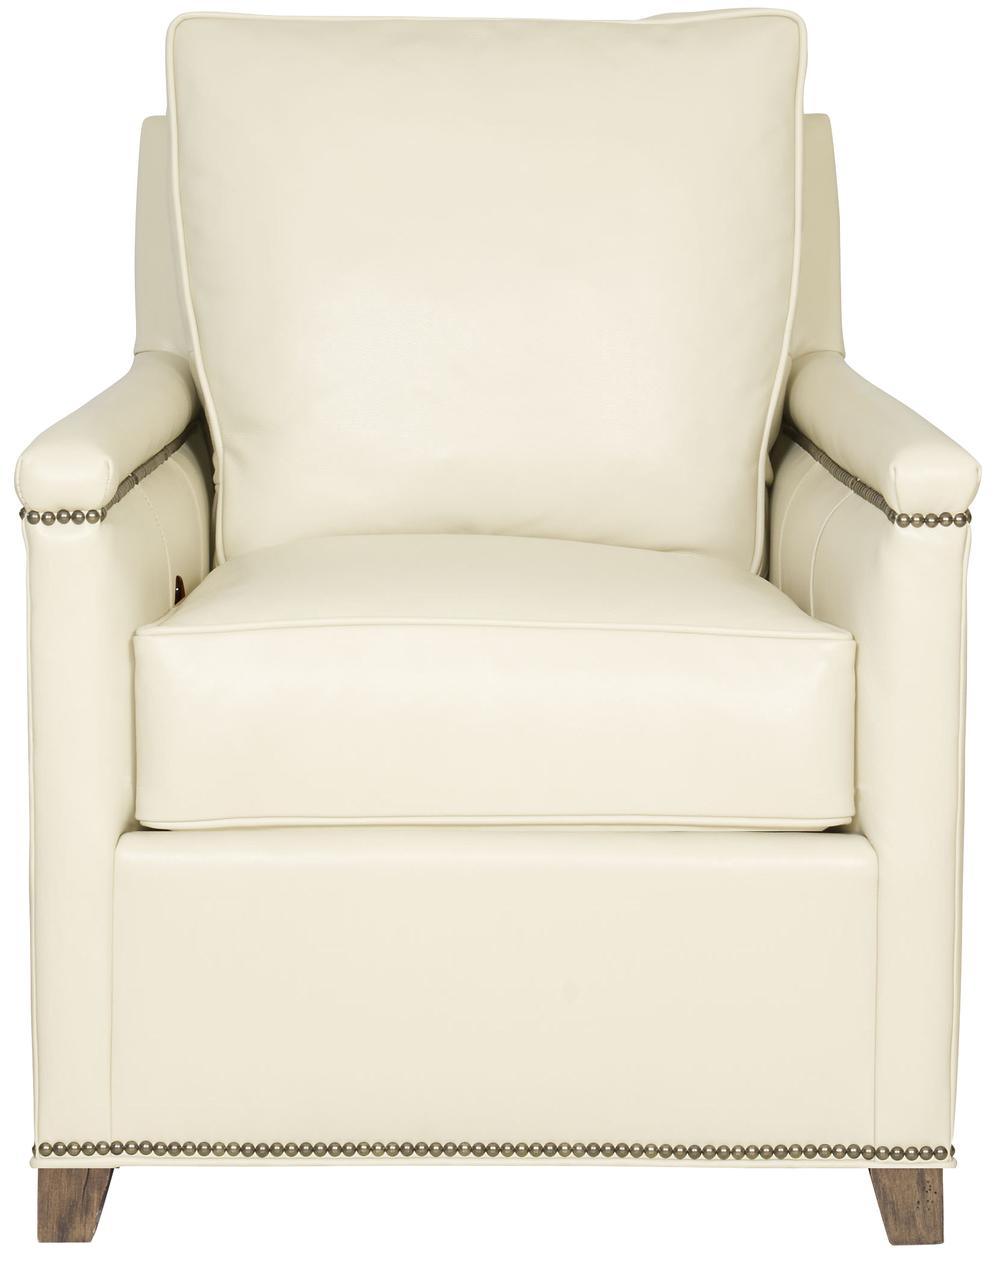 Vanguard Furniture - Liz Tilt Back Chair